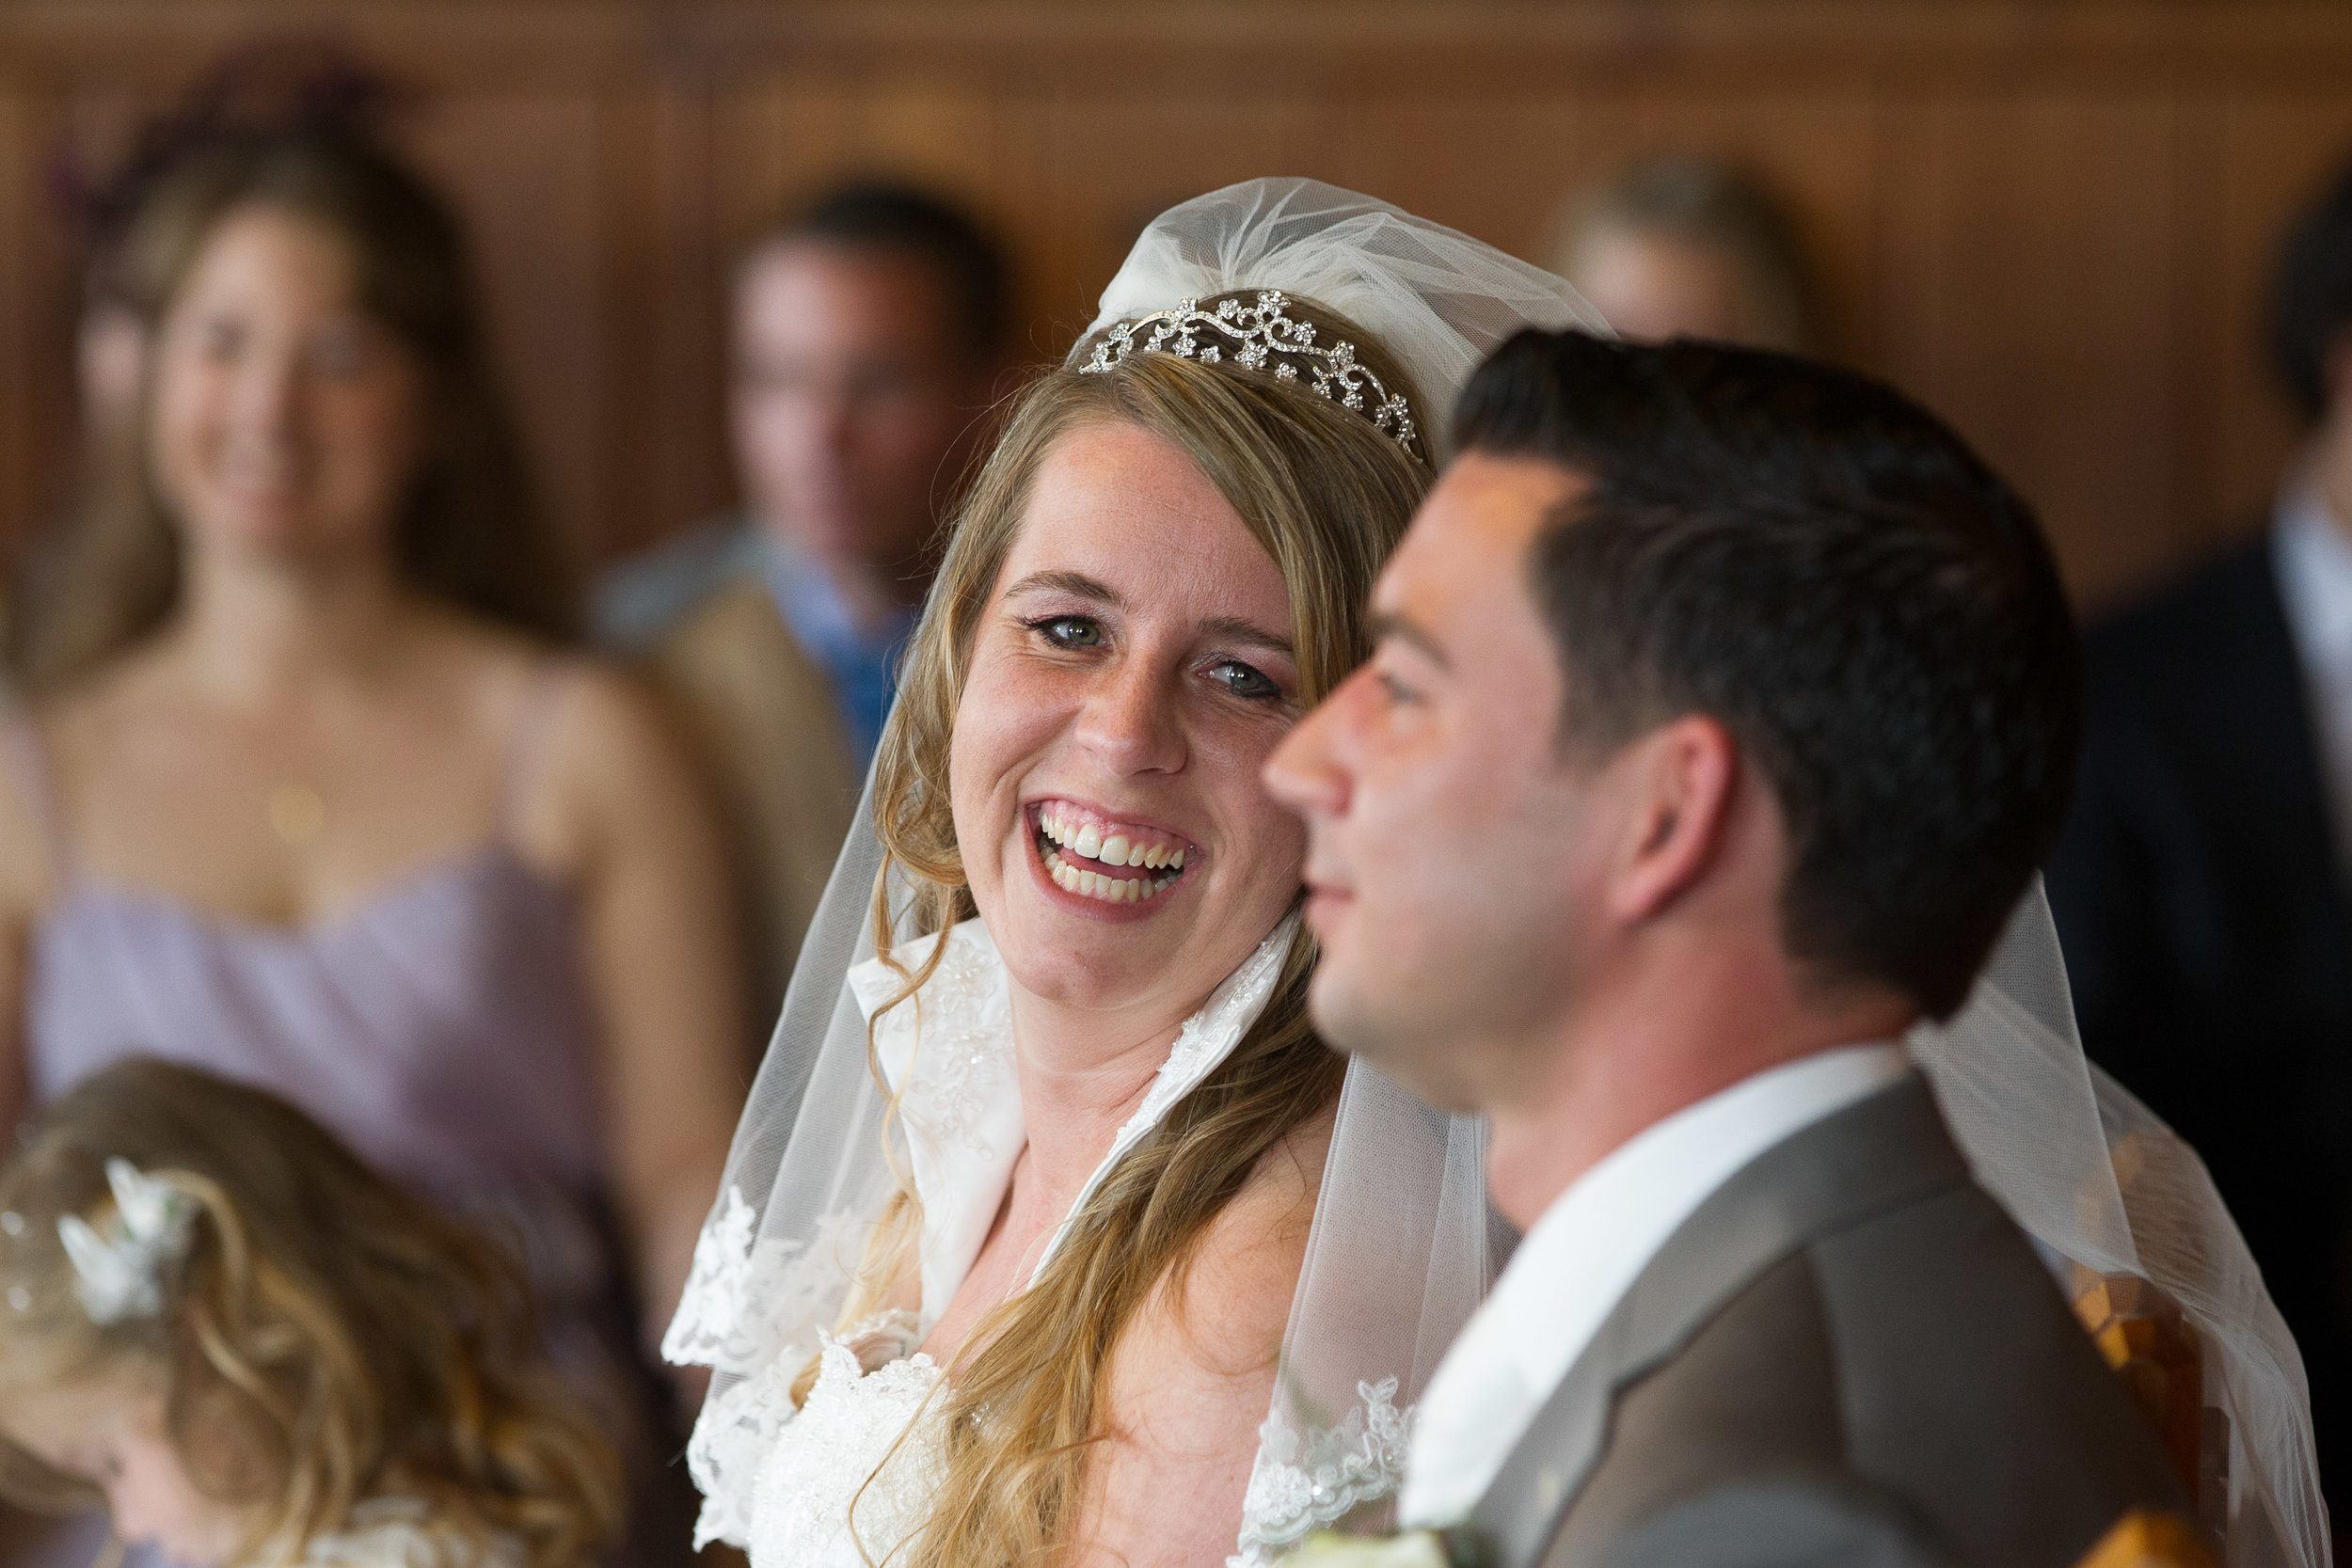 bruidsfotografie-trouwreportage-huwelijksfotografie-bruidsfotograaf-feestfotografie-Anouk en Edgar-66.jpg